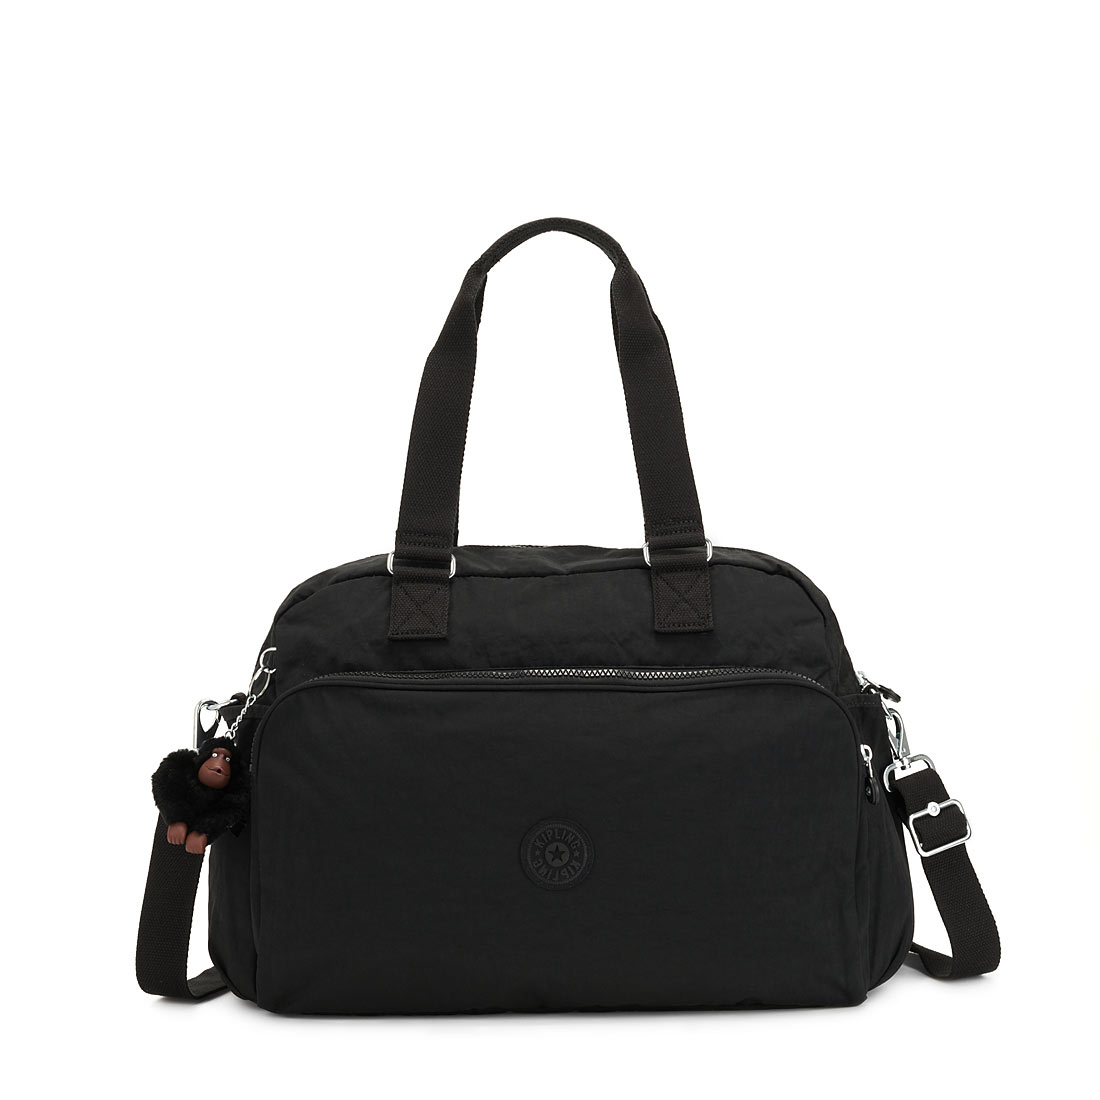 K15374J99 期間限定価格4/22まで JULY 公式 キプリング ボストンバッグ Black) BAG(True